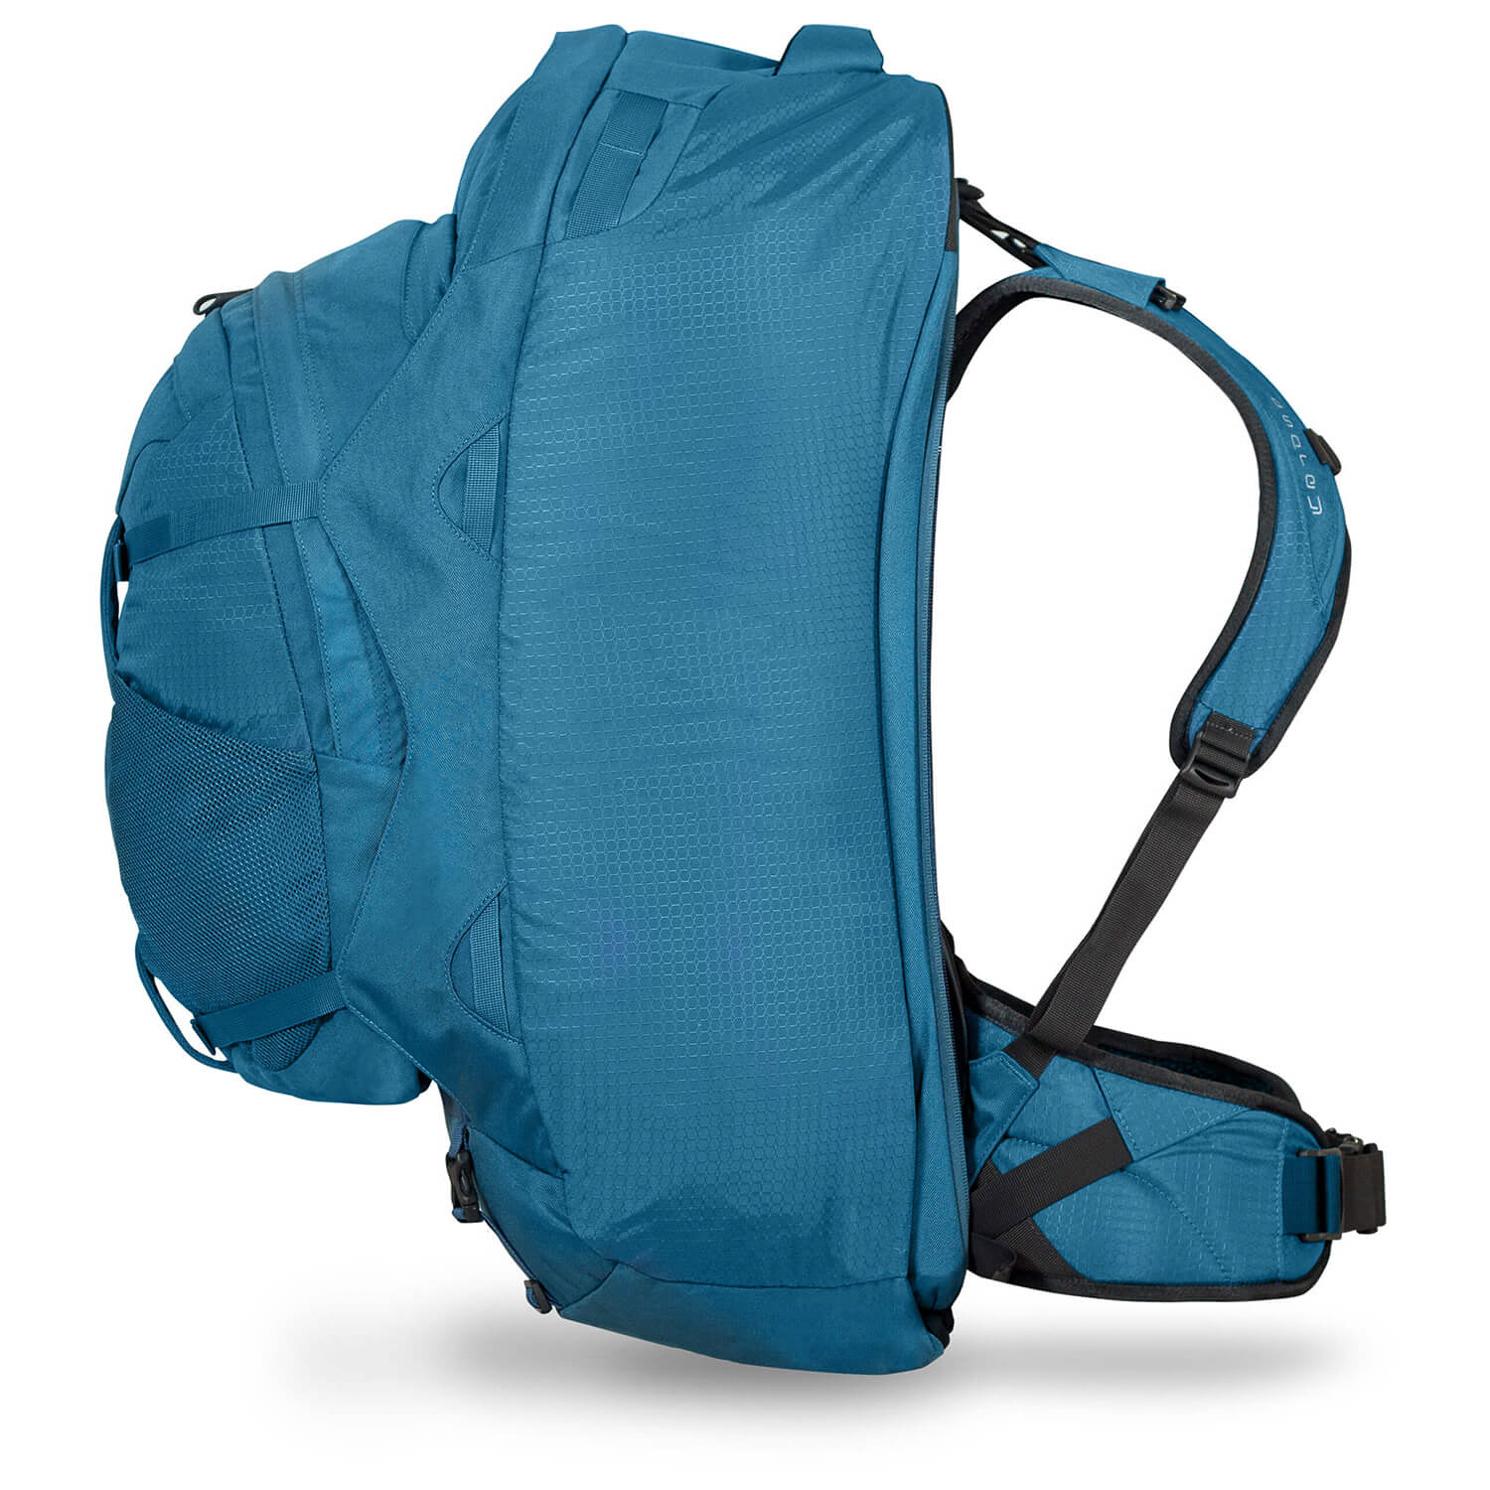 Osprey Farpoint 70 - Travel Backpack   Free UK Delivery   Alpinetrek ... 4472f85ca7